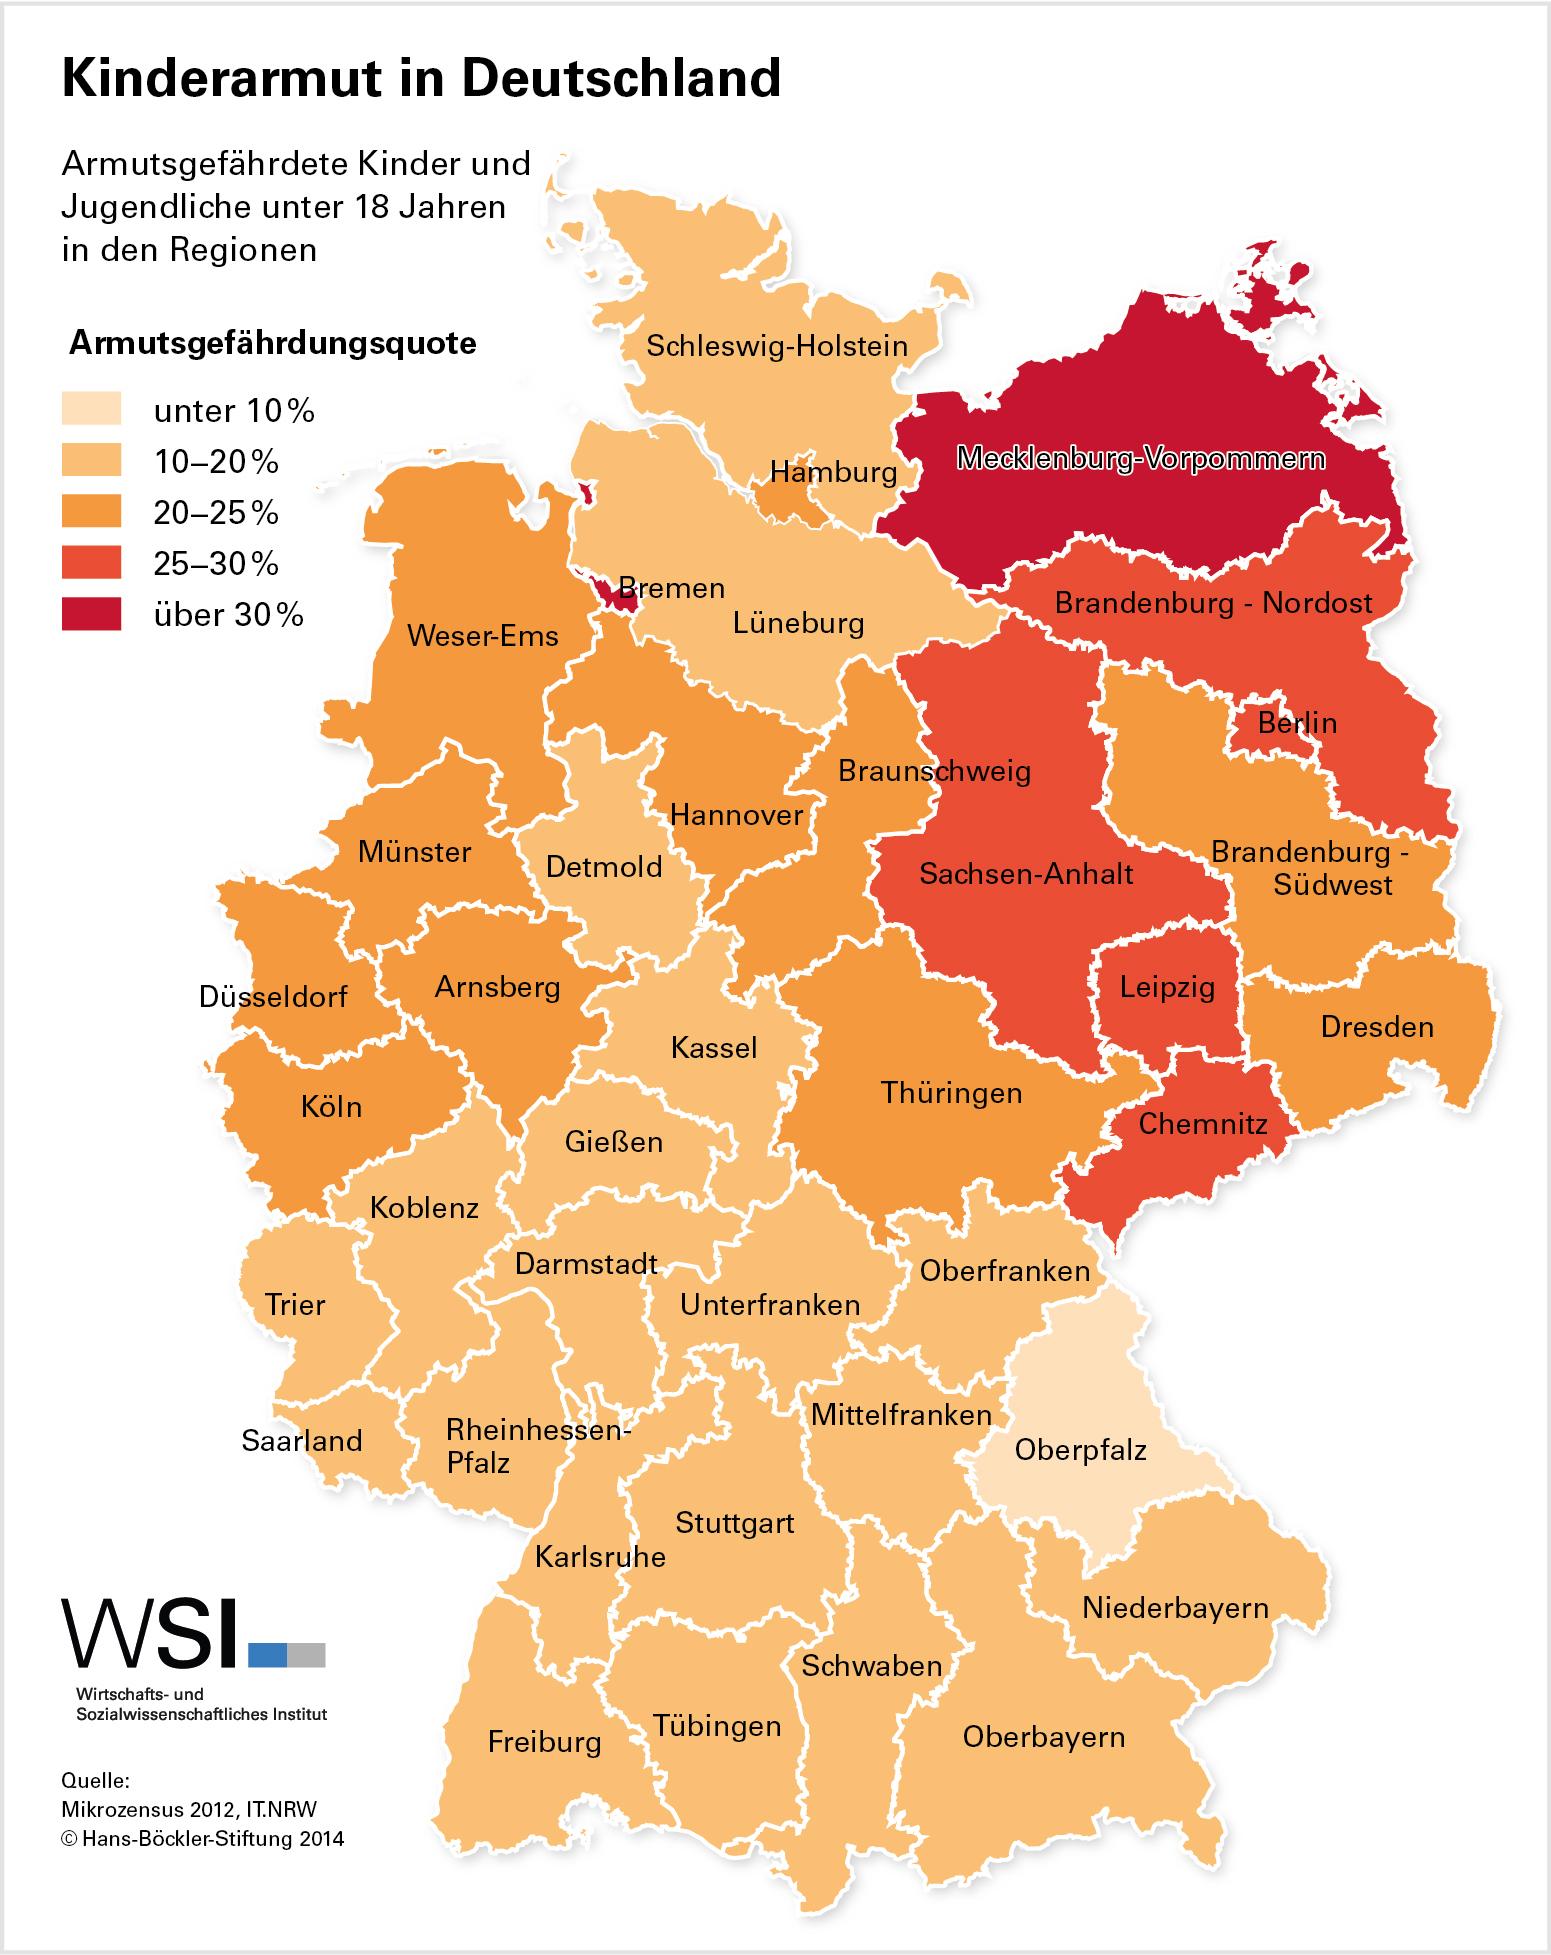 1551 x 1955 jpeg 1256kBDeutschland